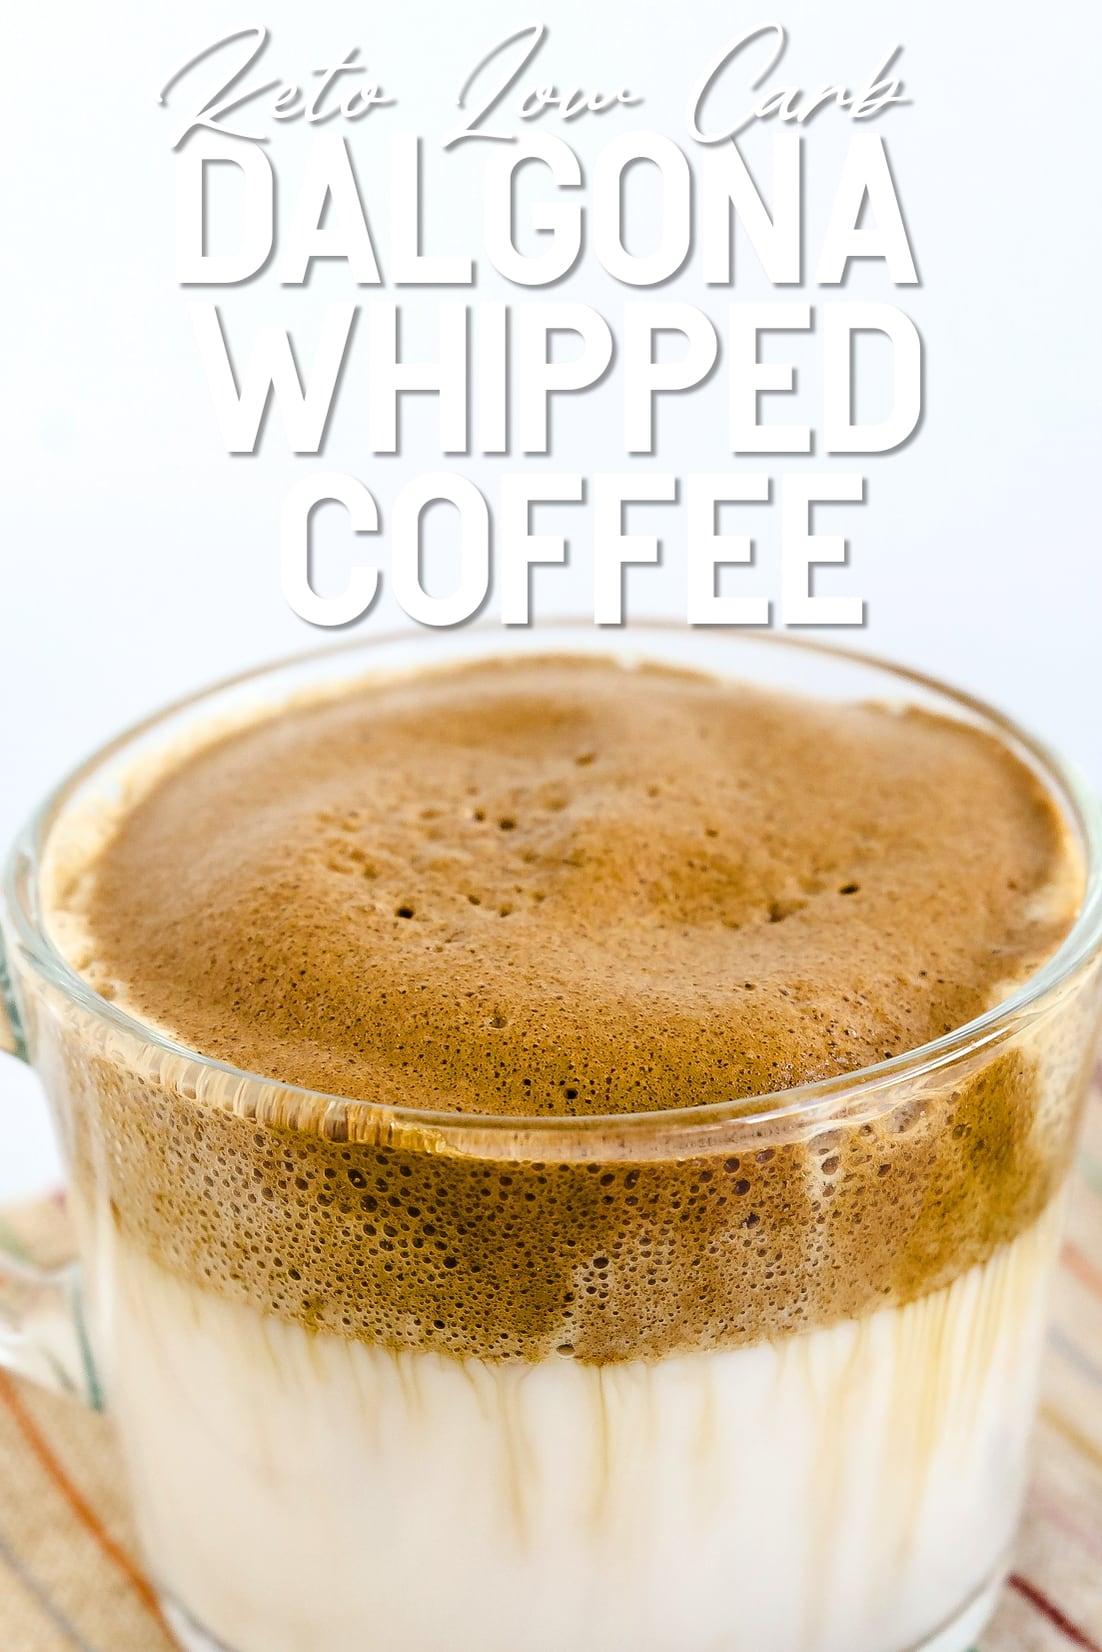 Keto Dalgona Coffee served in a glass cup